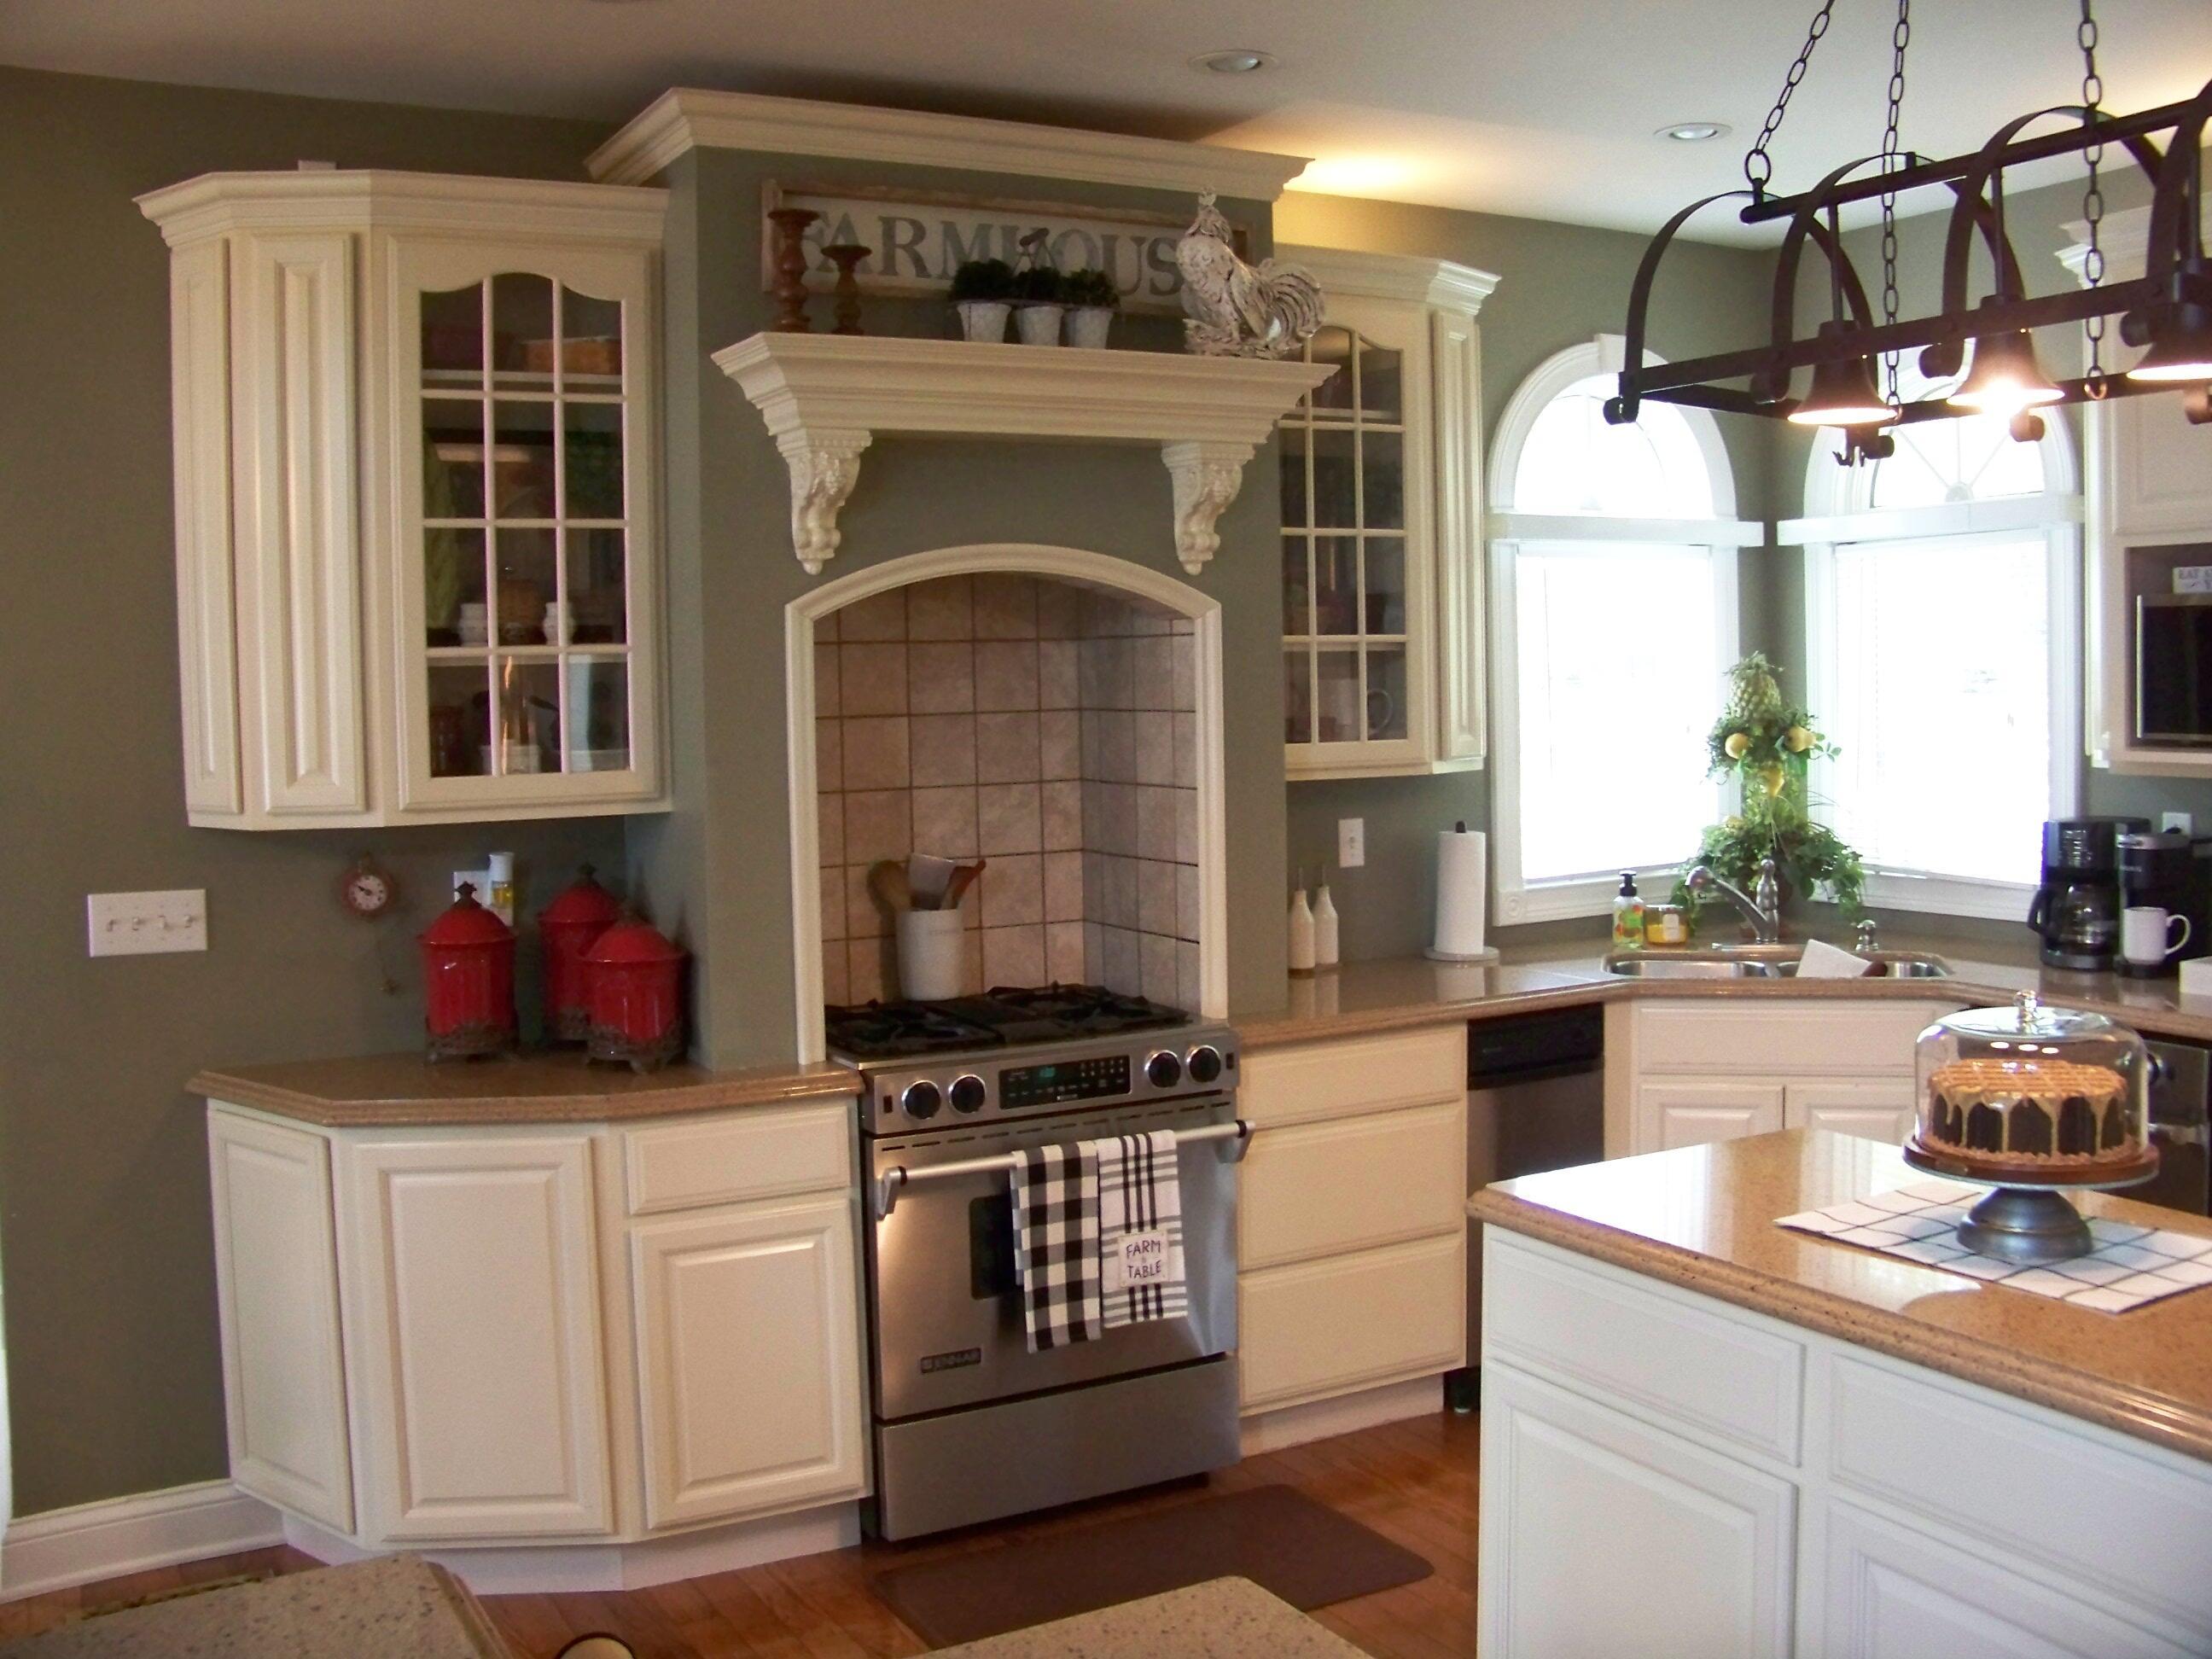 7857 Hwy 460 Property Photo 11